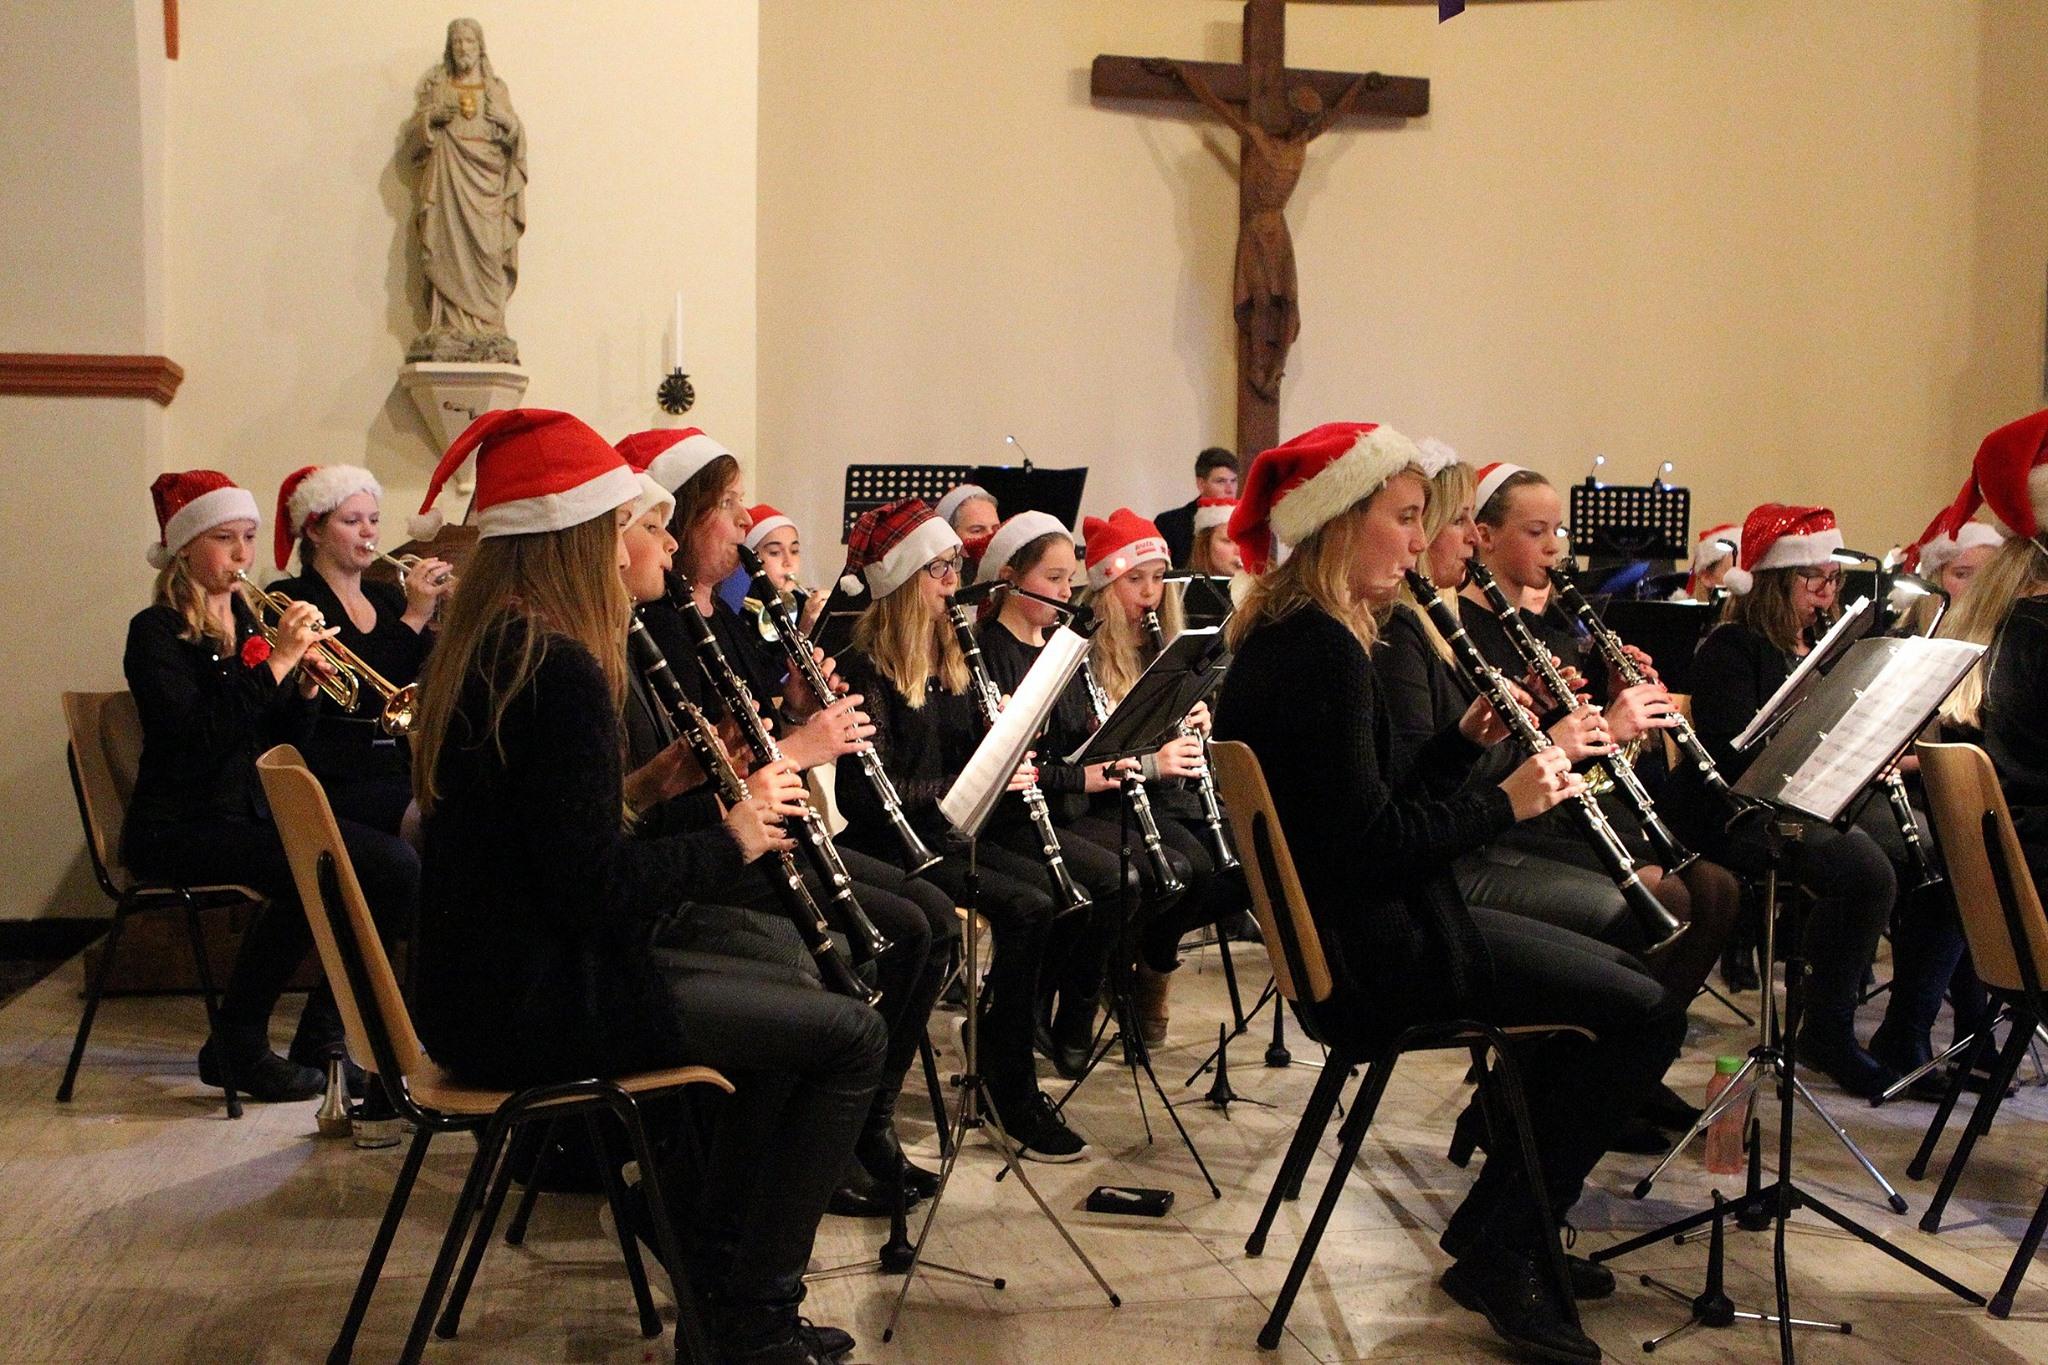 Kerstconcert Harmonie Sint Jan en popkoor Wiezz